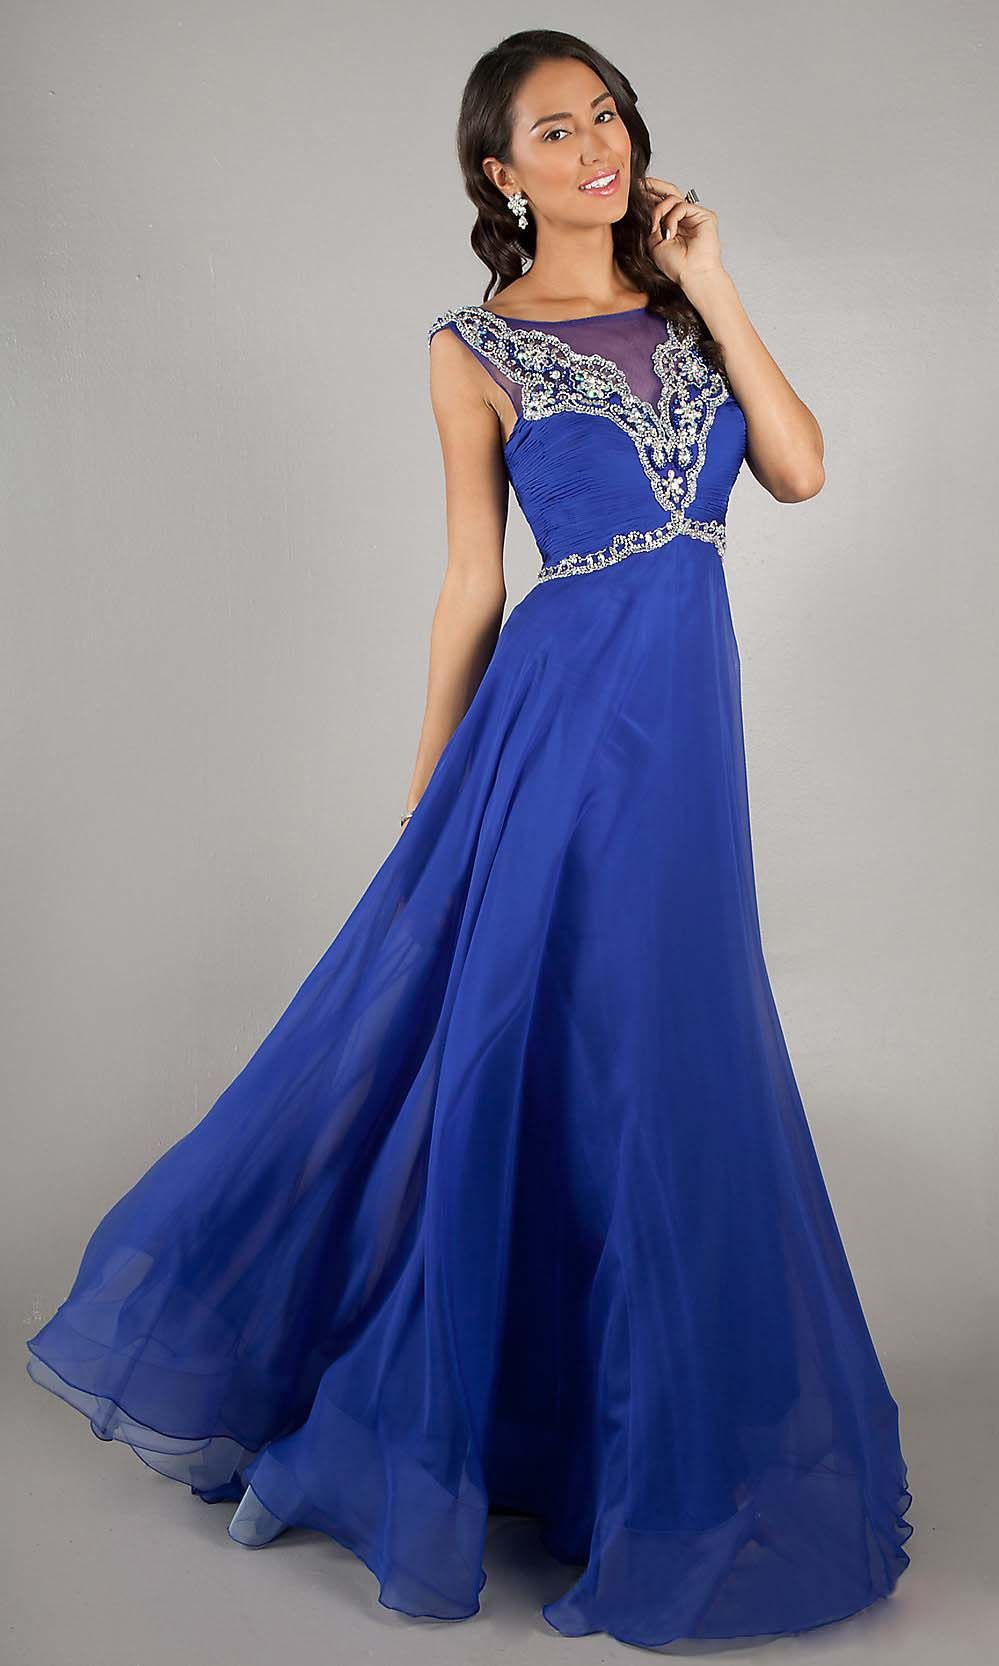 Affordable Blue Prom Dresses